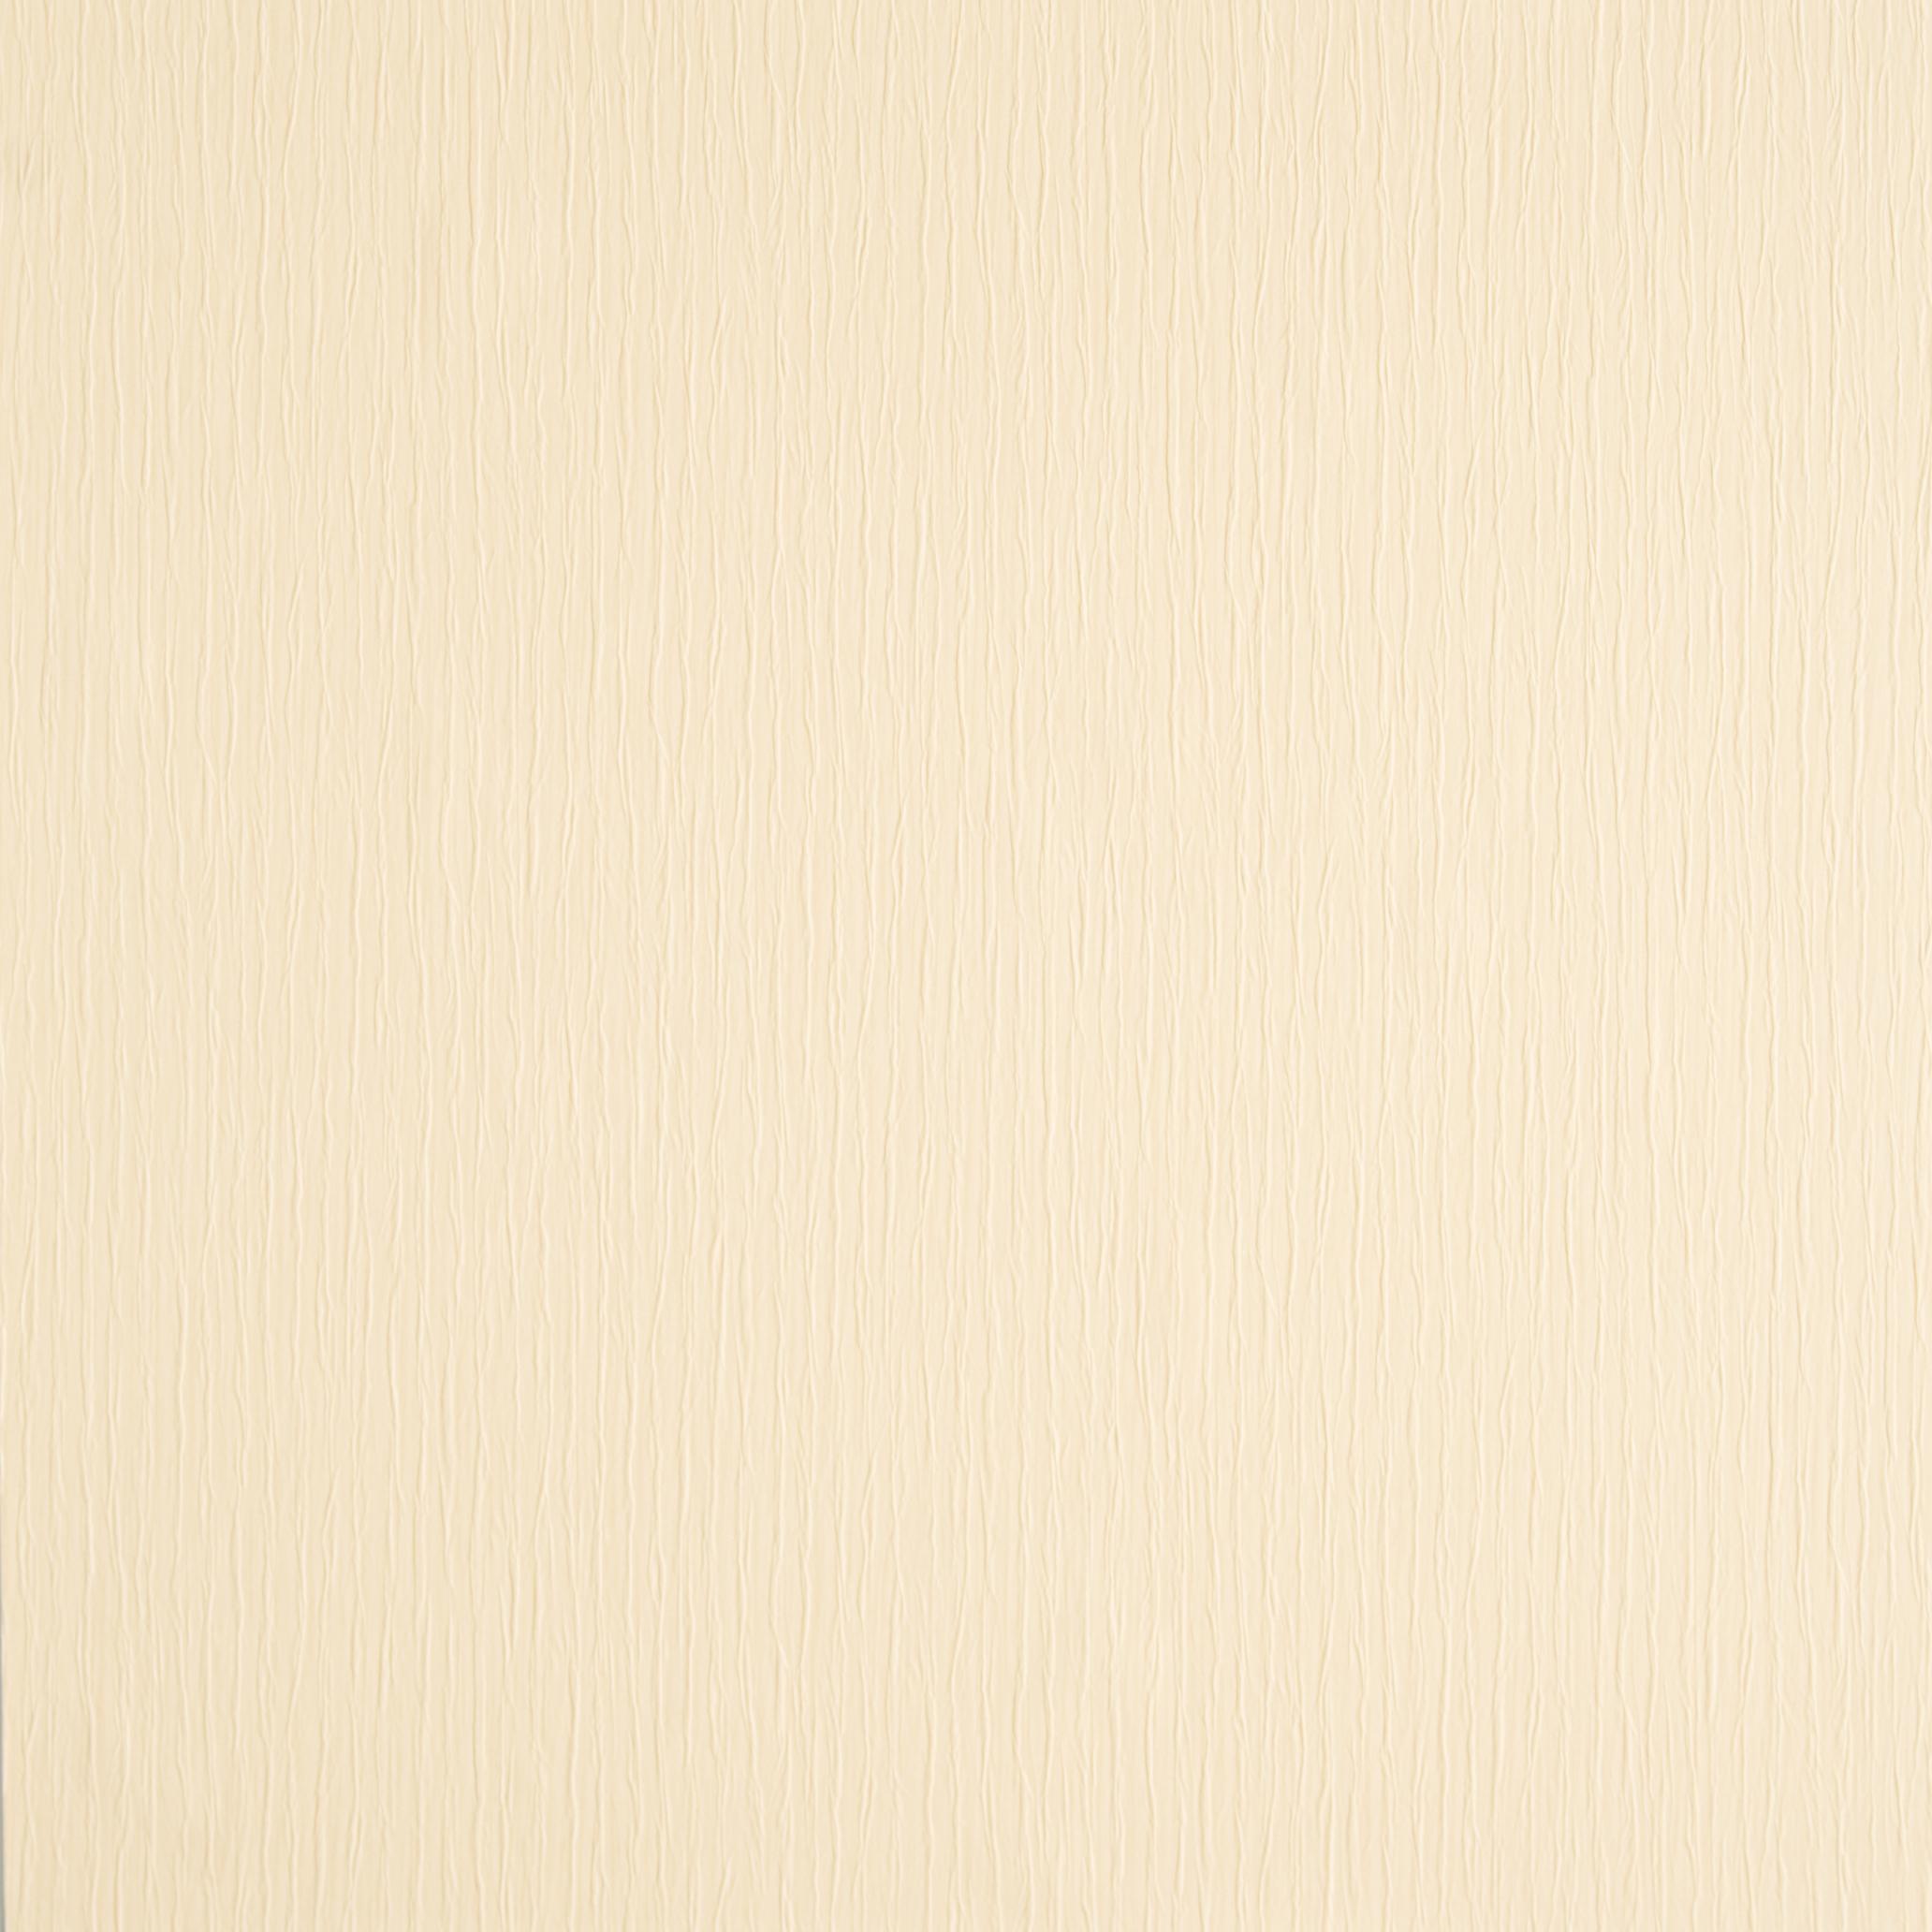 Обои  BN International,  коллекция Colour Line, артикул49471